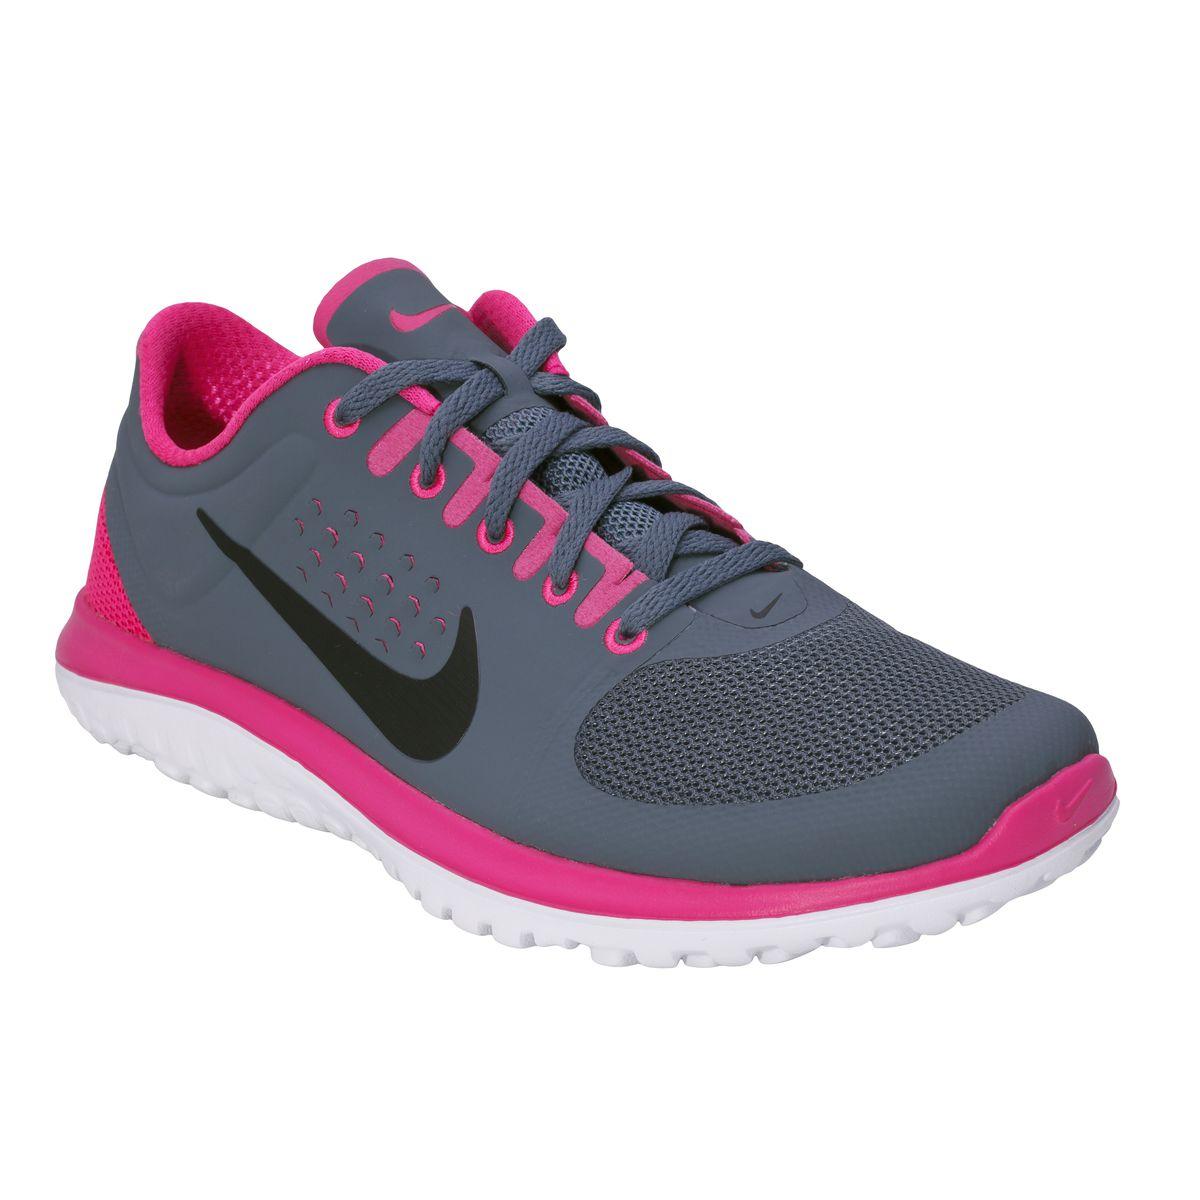 Womens Nike FS Lite Run Running Shoe. Loading zoom